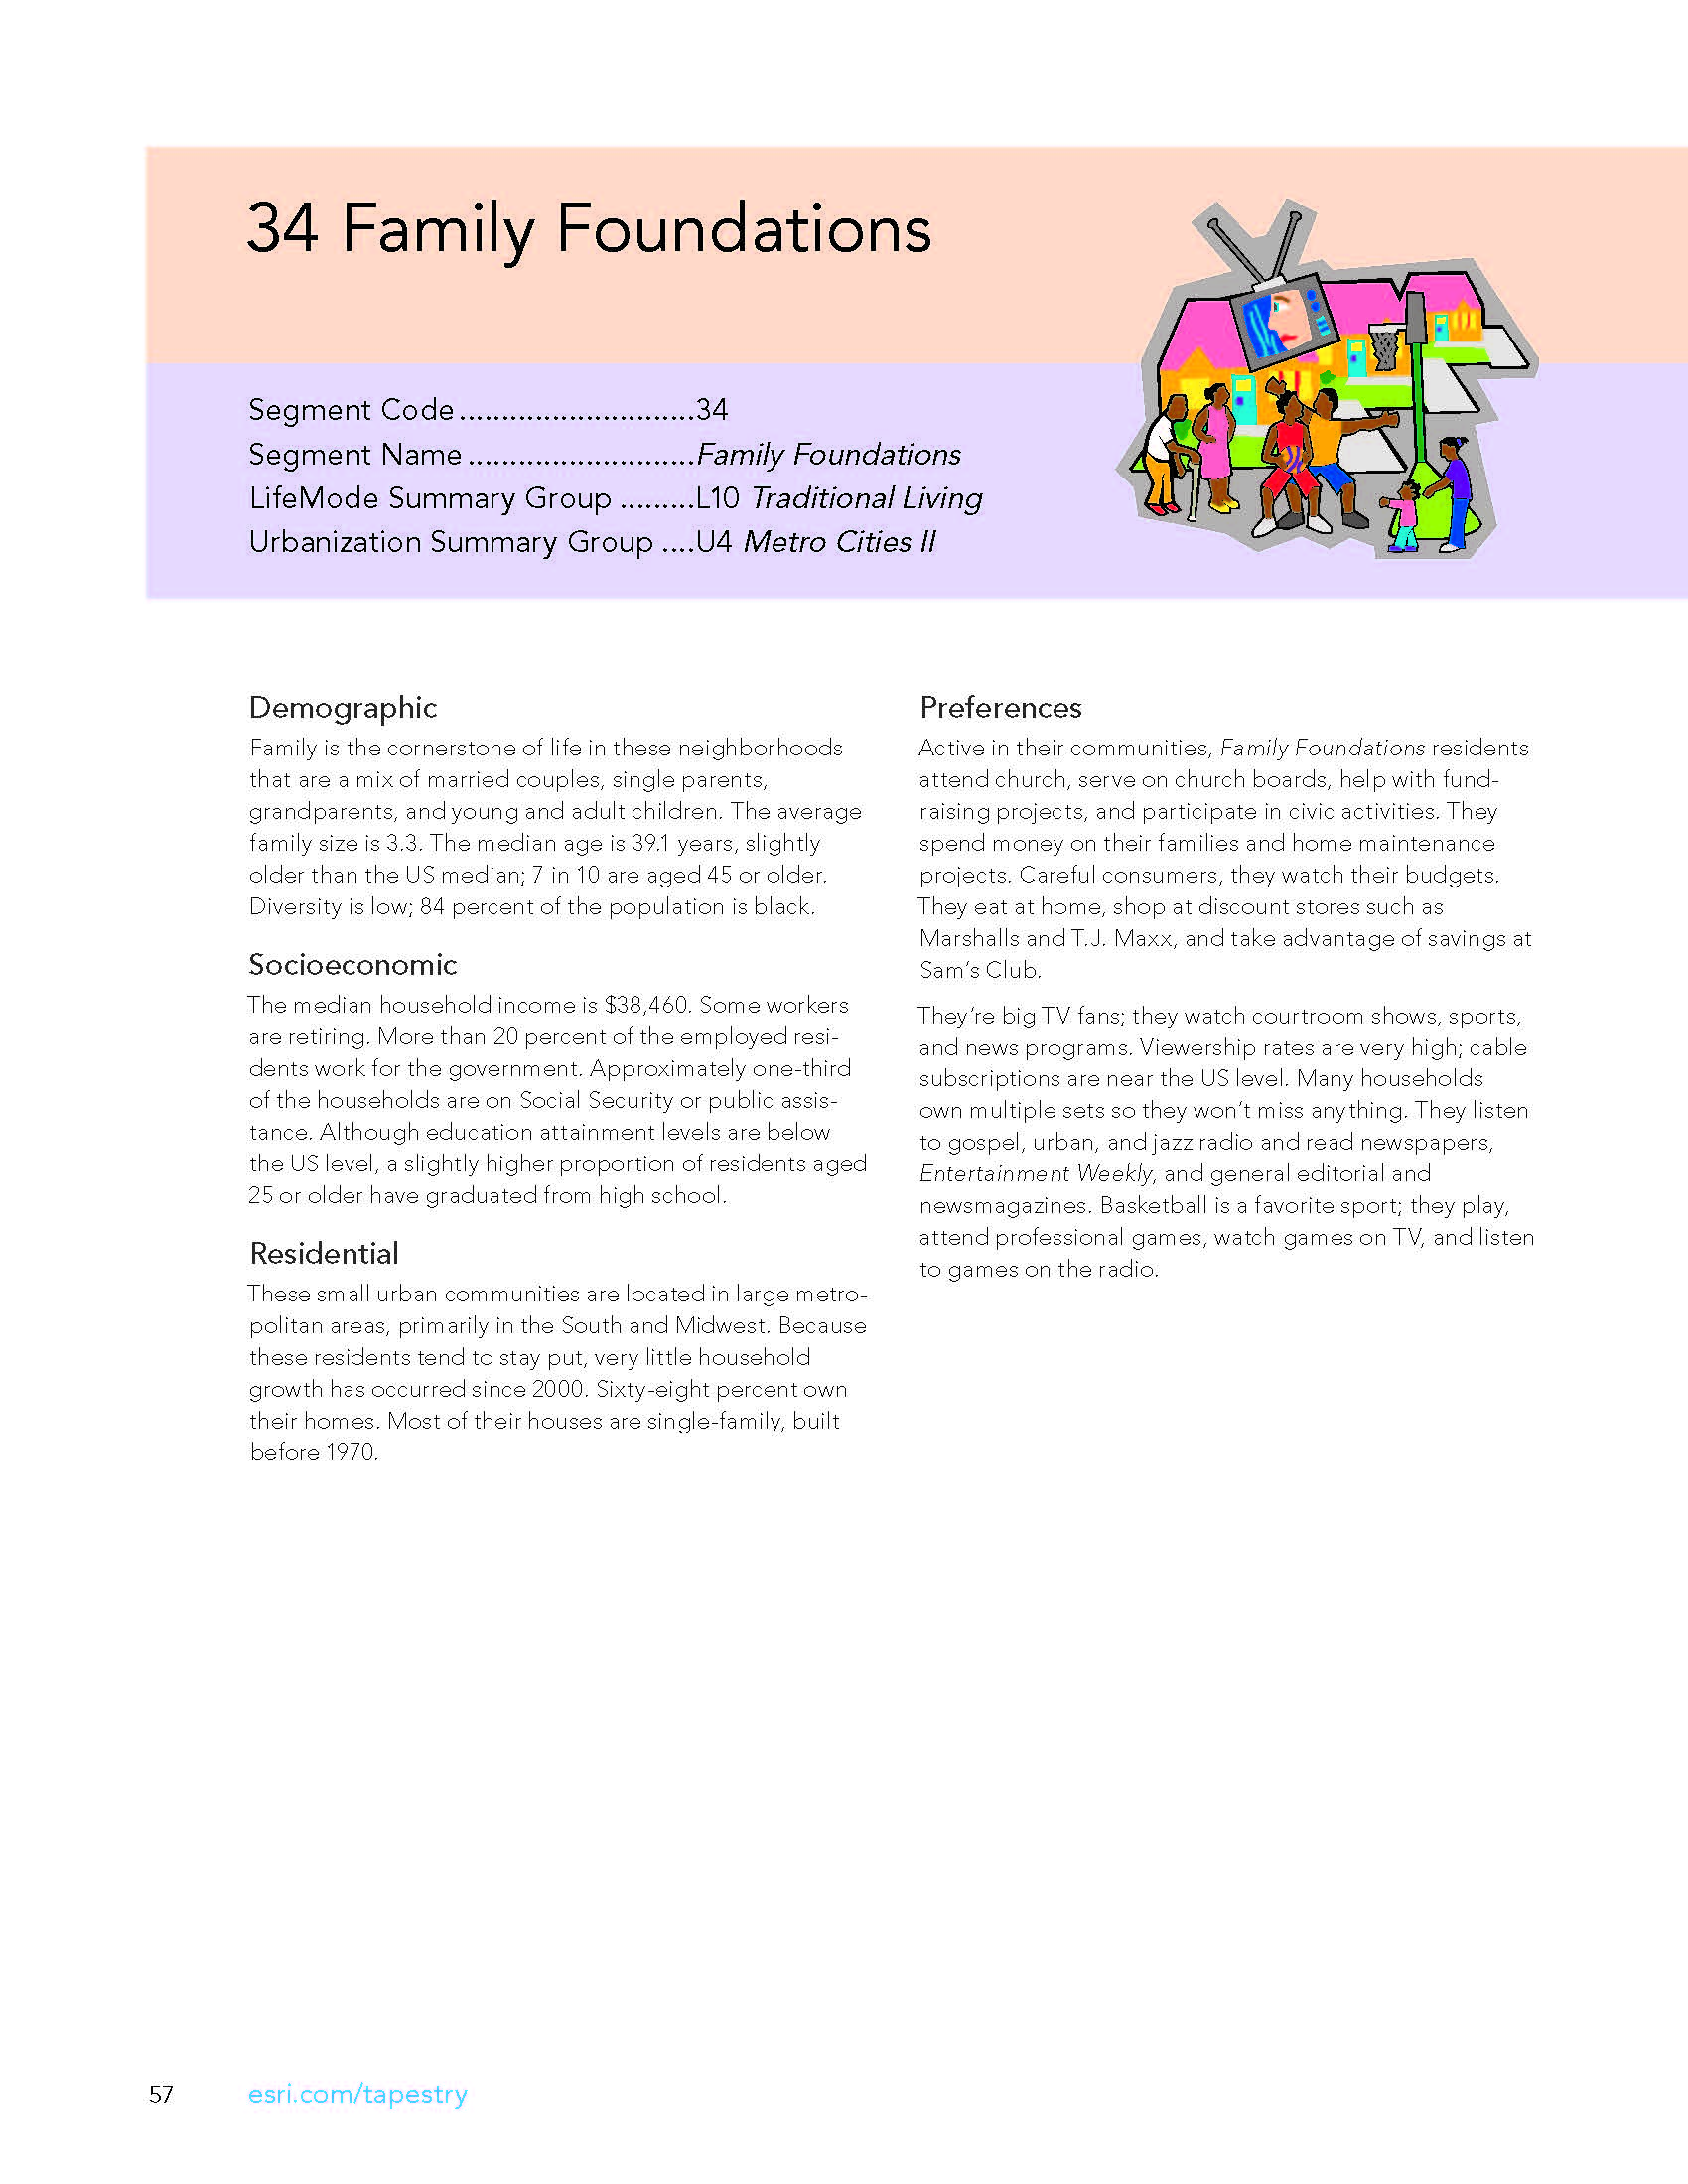 tapestry-segmentation_Page_60.jpg